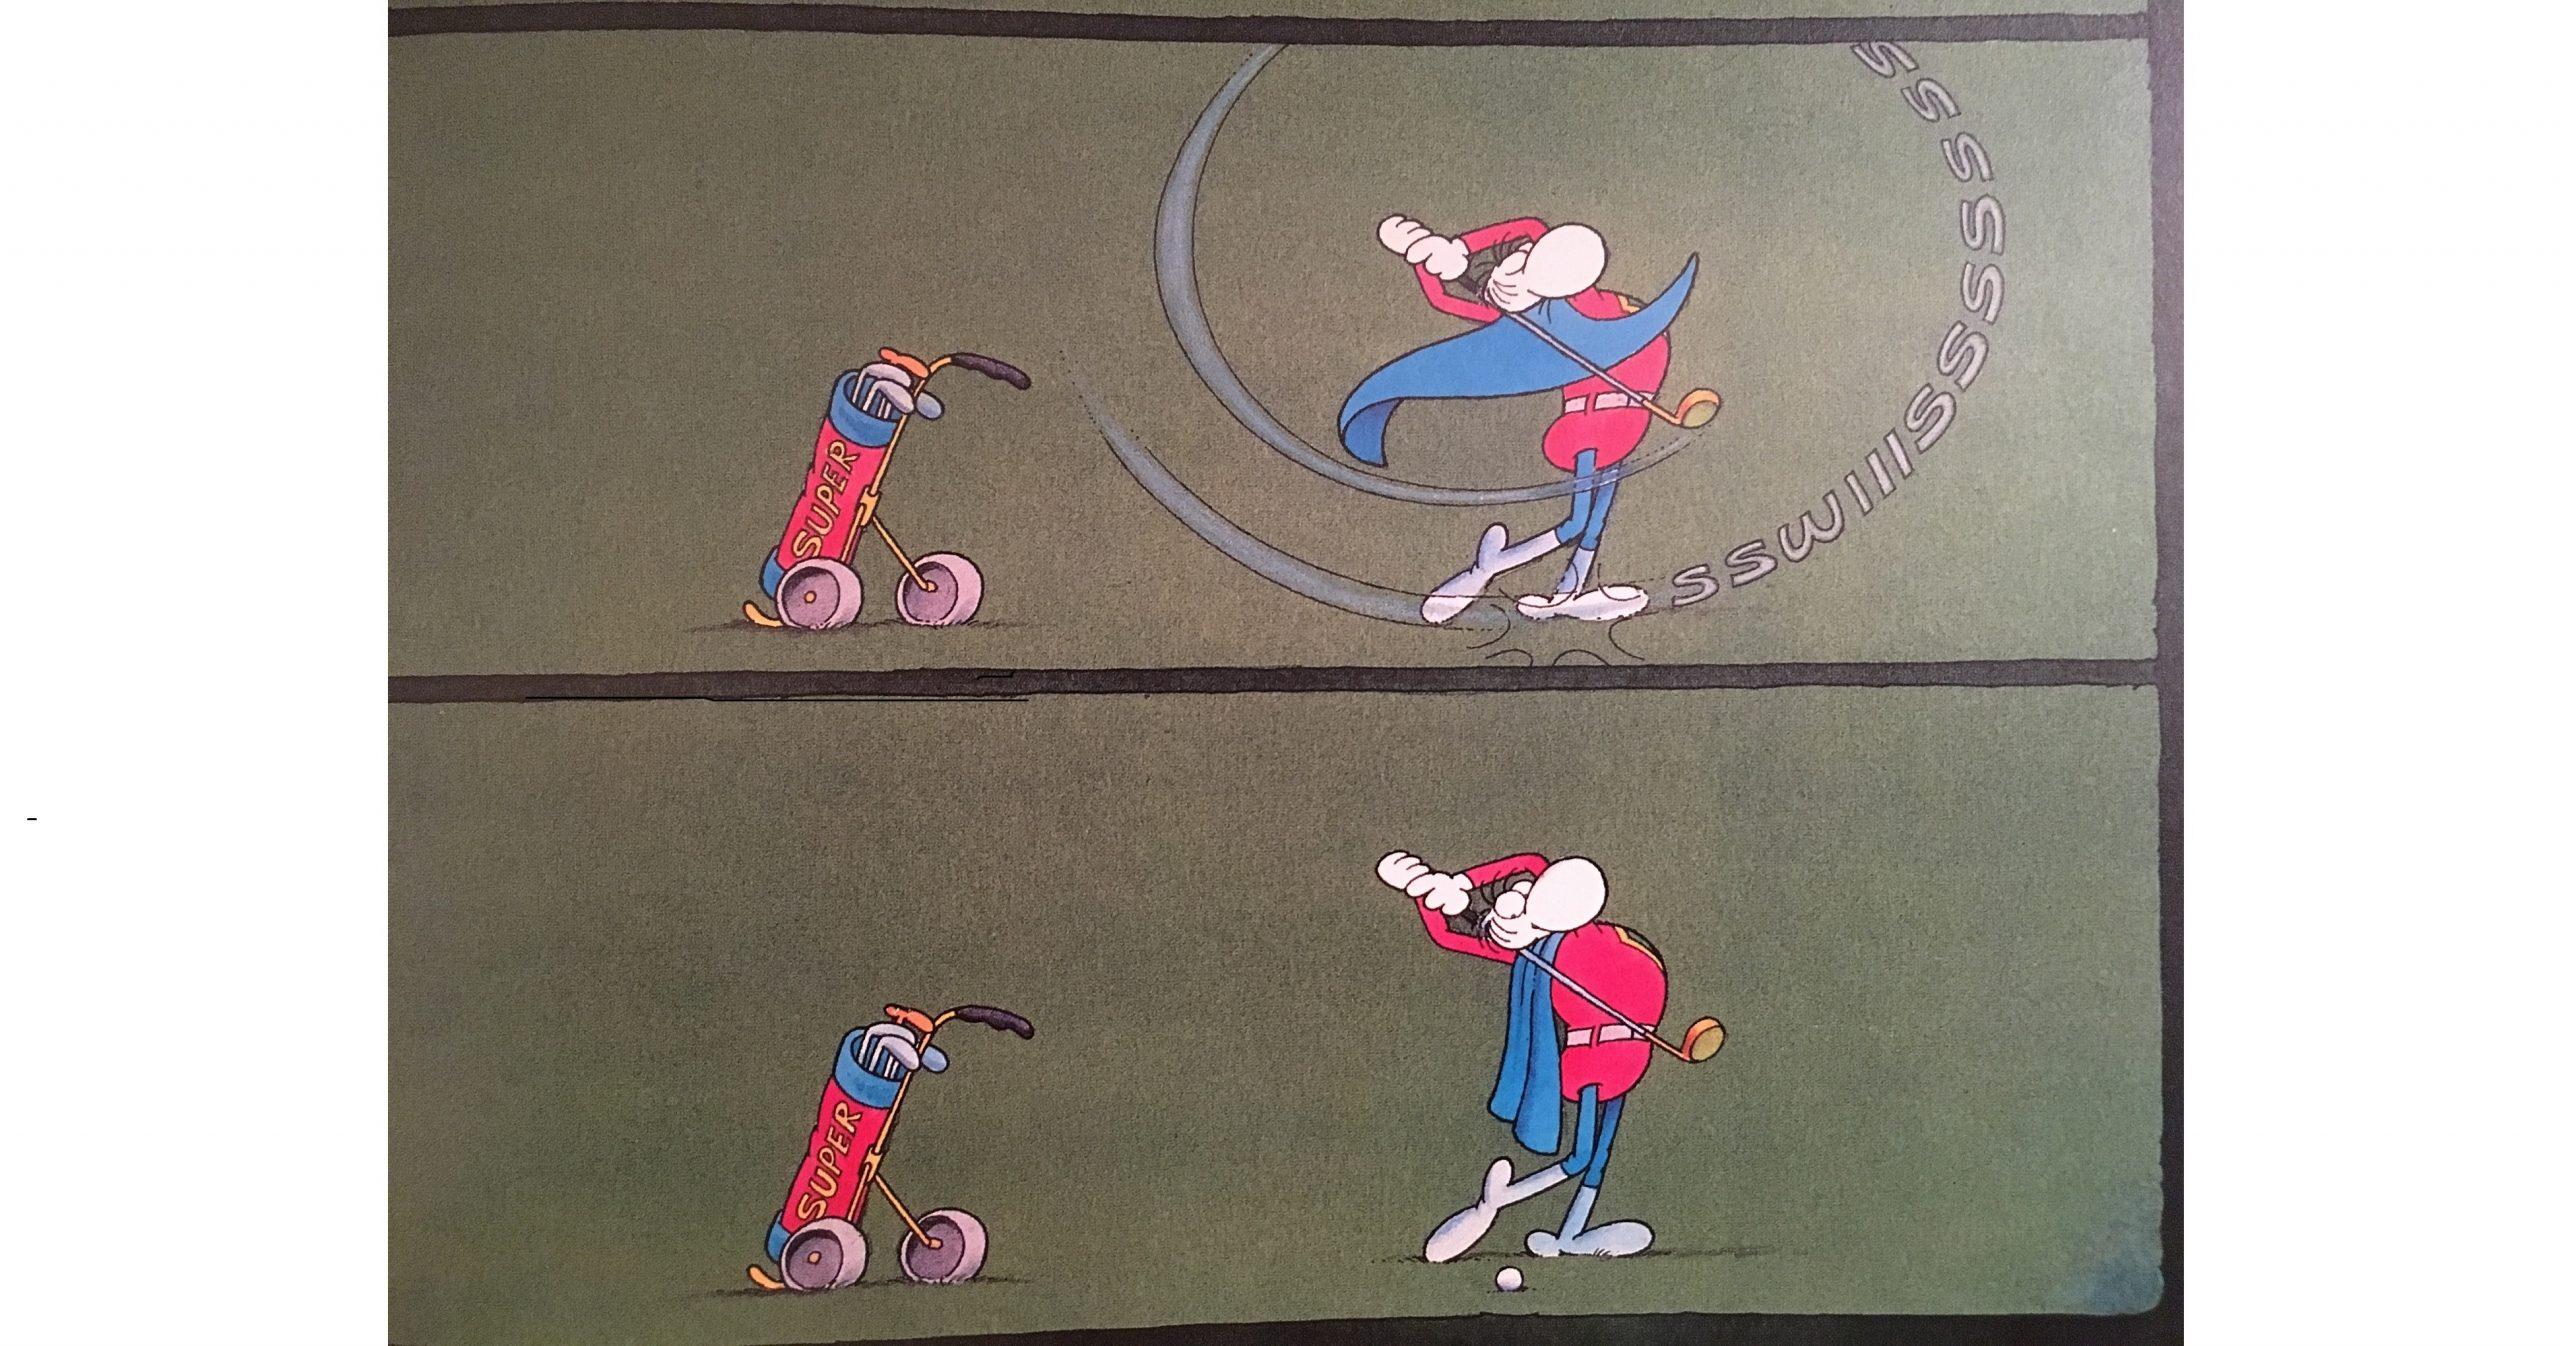 Golf Society Day 20th Feb